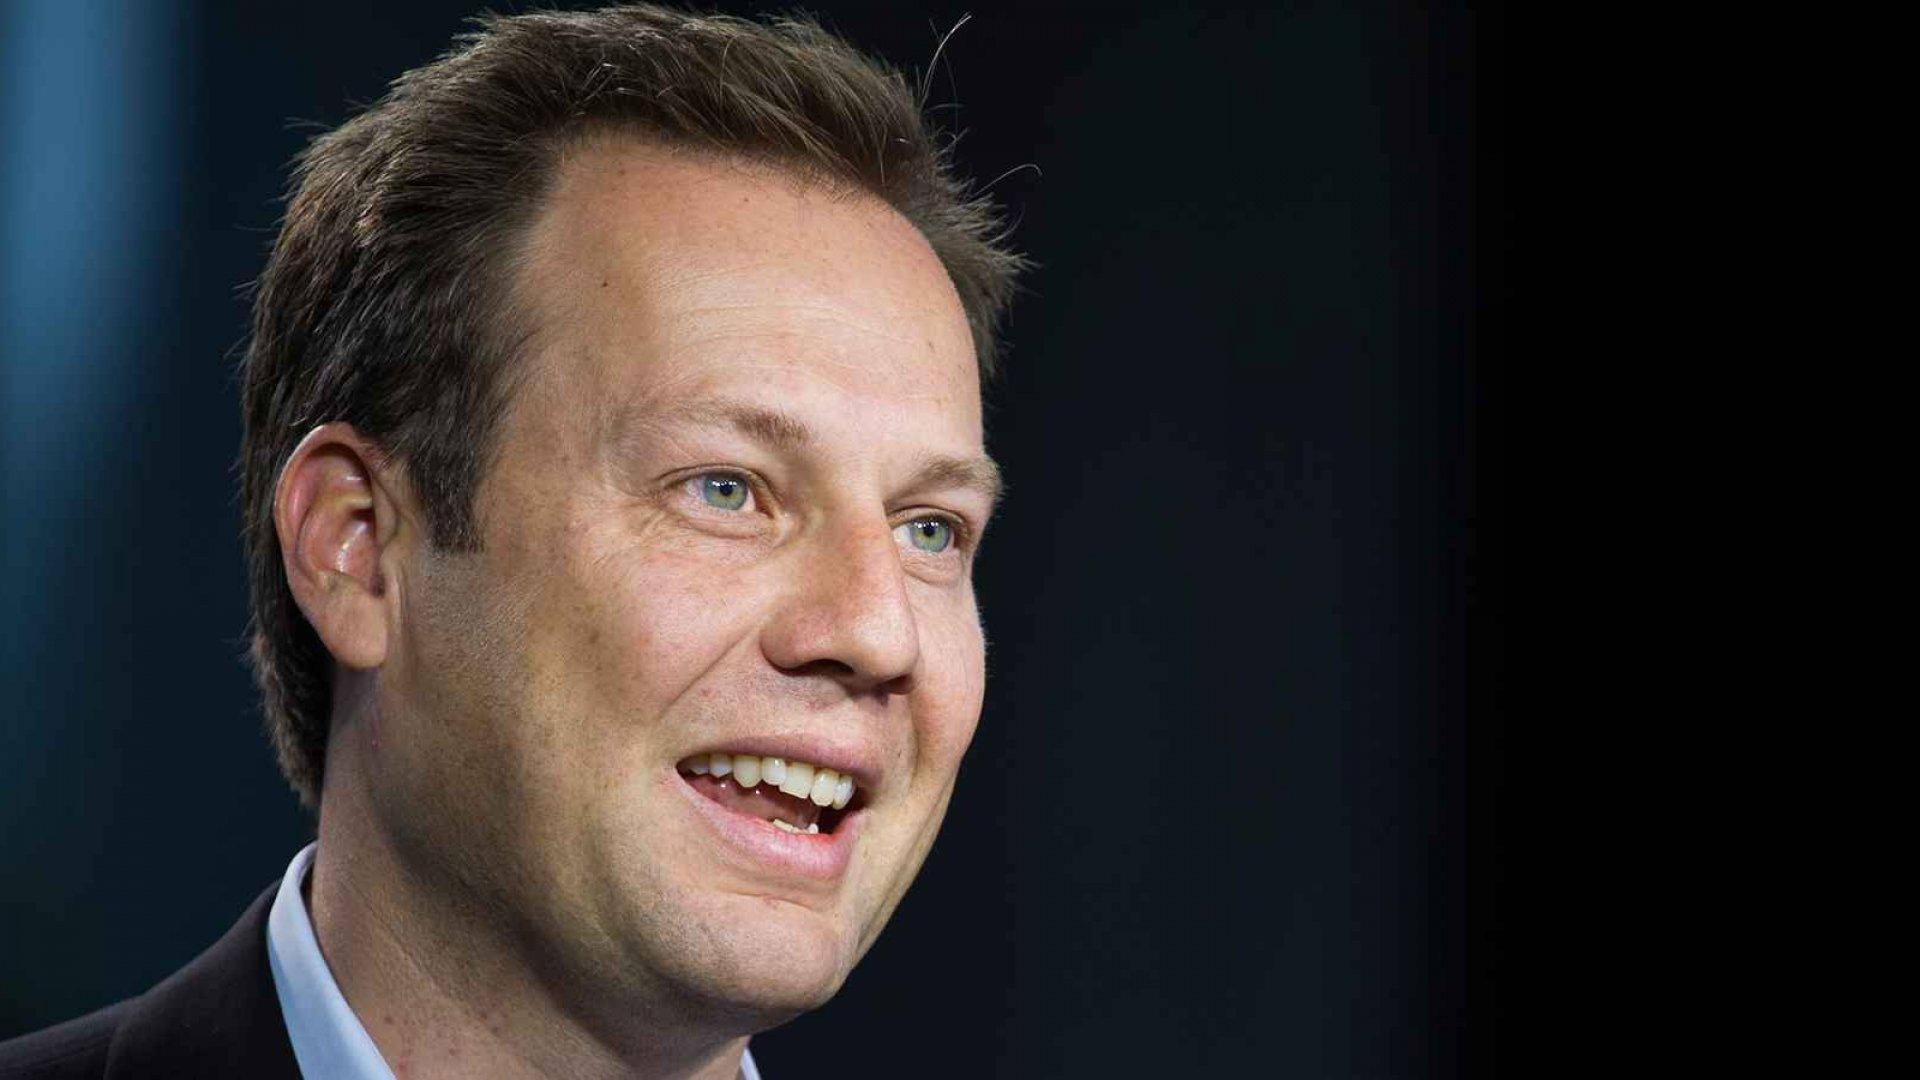 Trulia co-founder Pete Flint